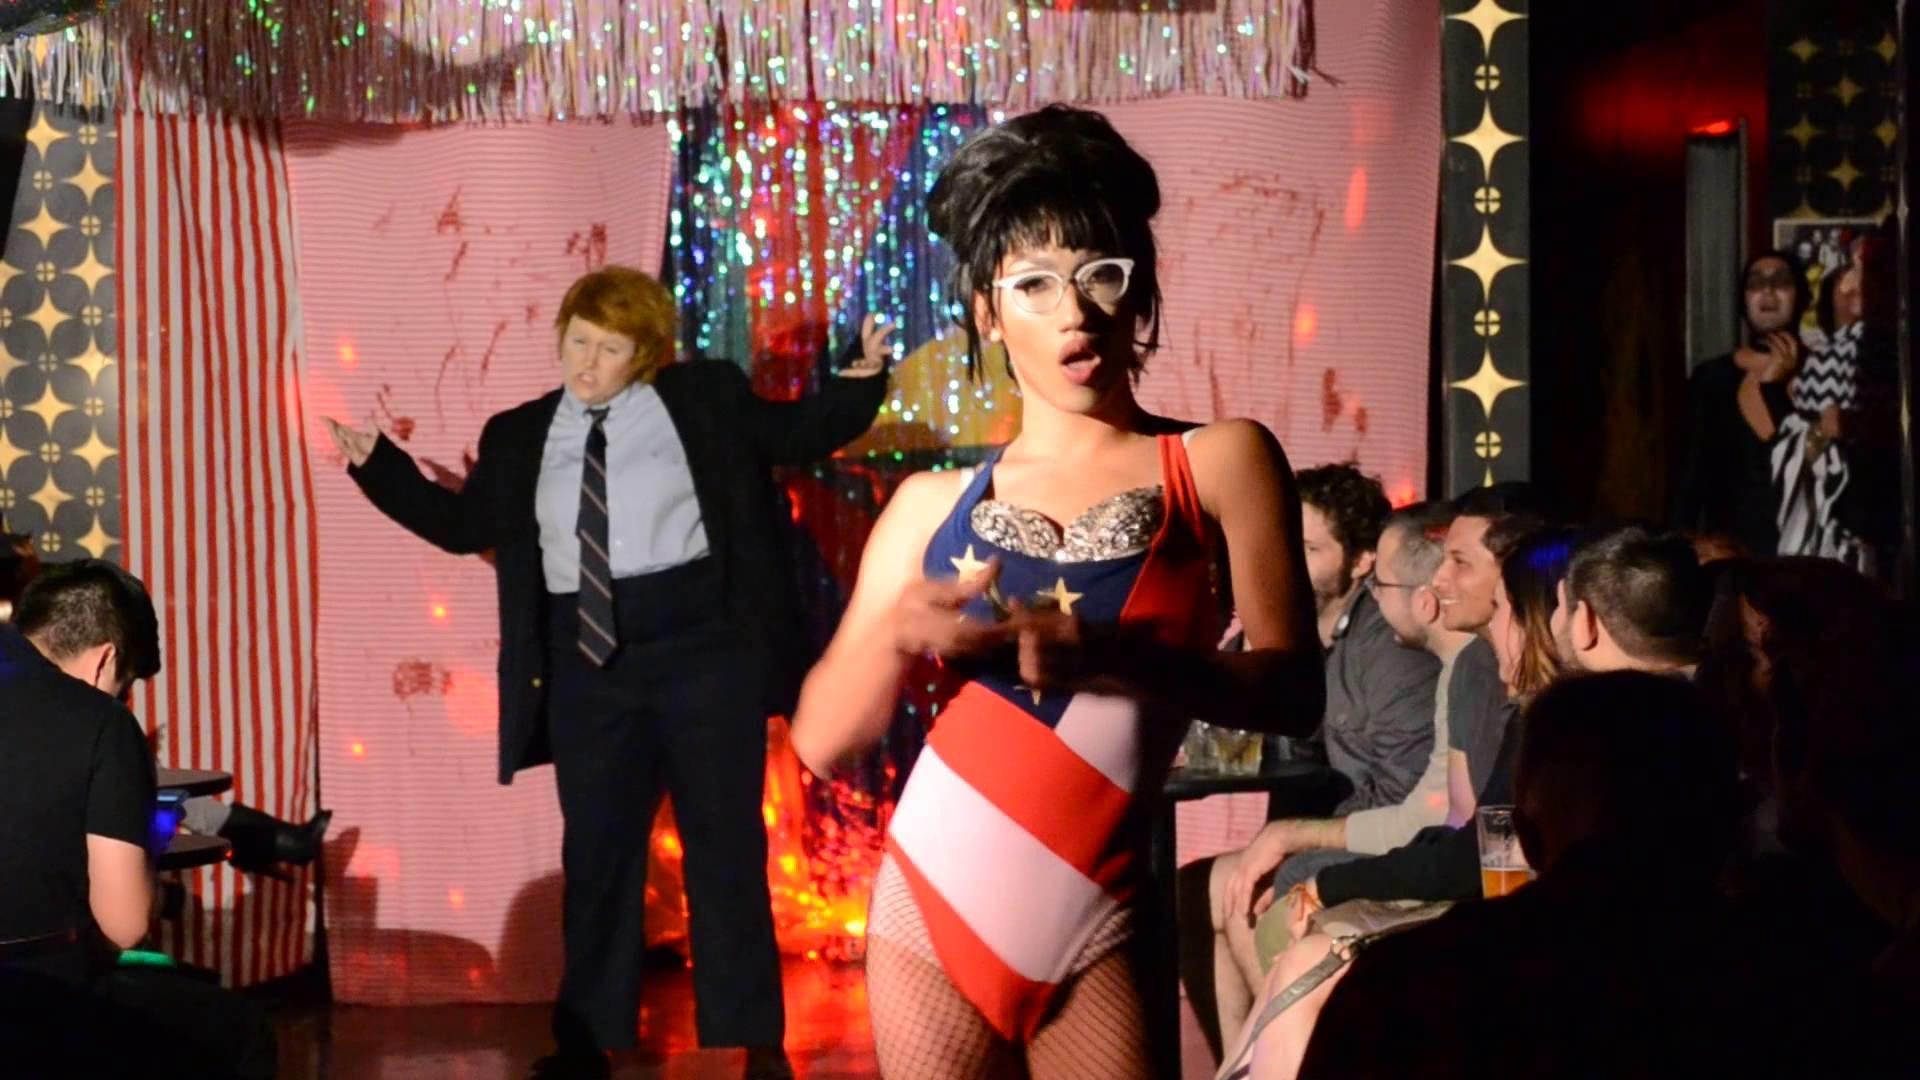 Stirfriedmermaid and Louie Minati (as Donald Trump and Sarah Palin) –  American Badass – YouTube